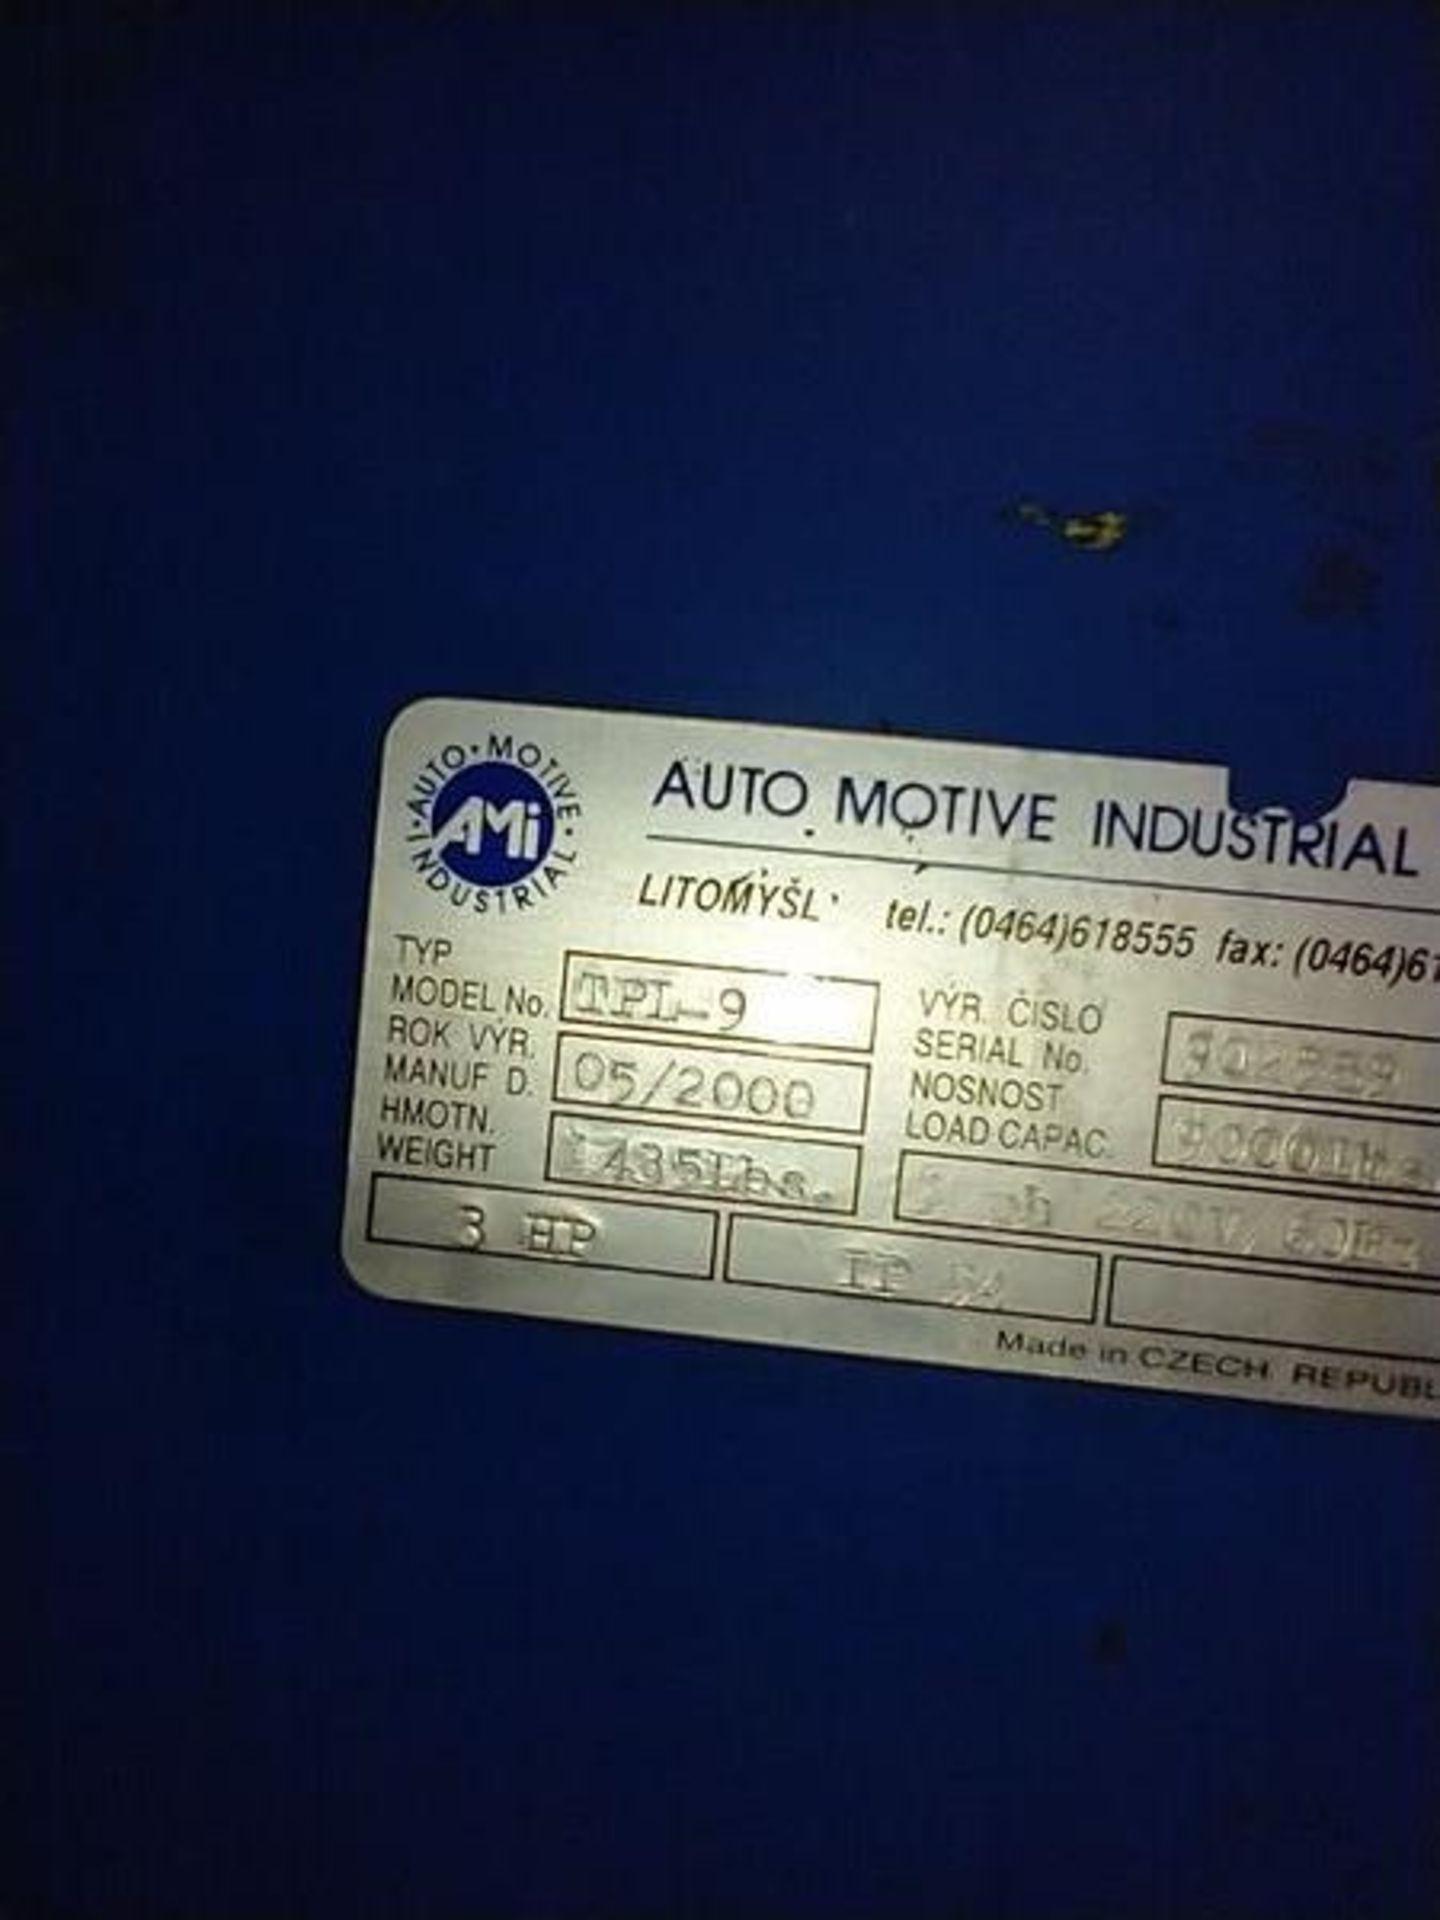 AUTO MOTIVE 2 POINT LIFT - MODEL TPL-9 , 3HP , 9000LB CAP - Image 5 of 7